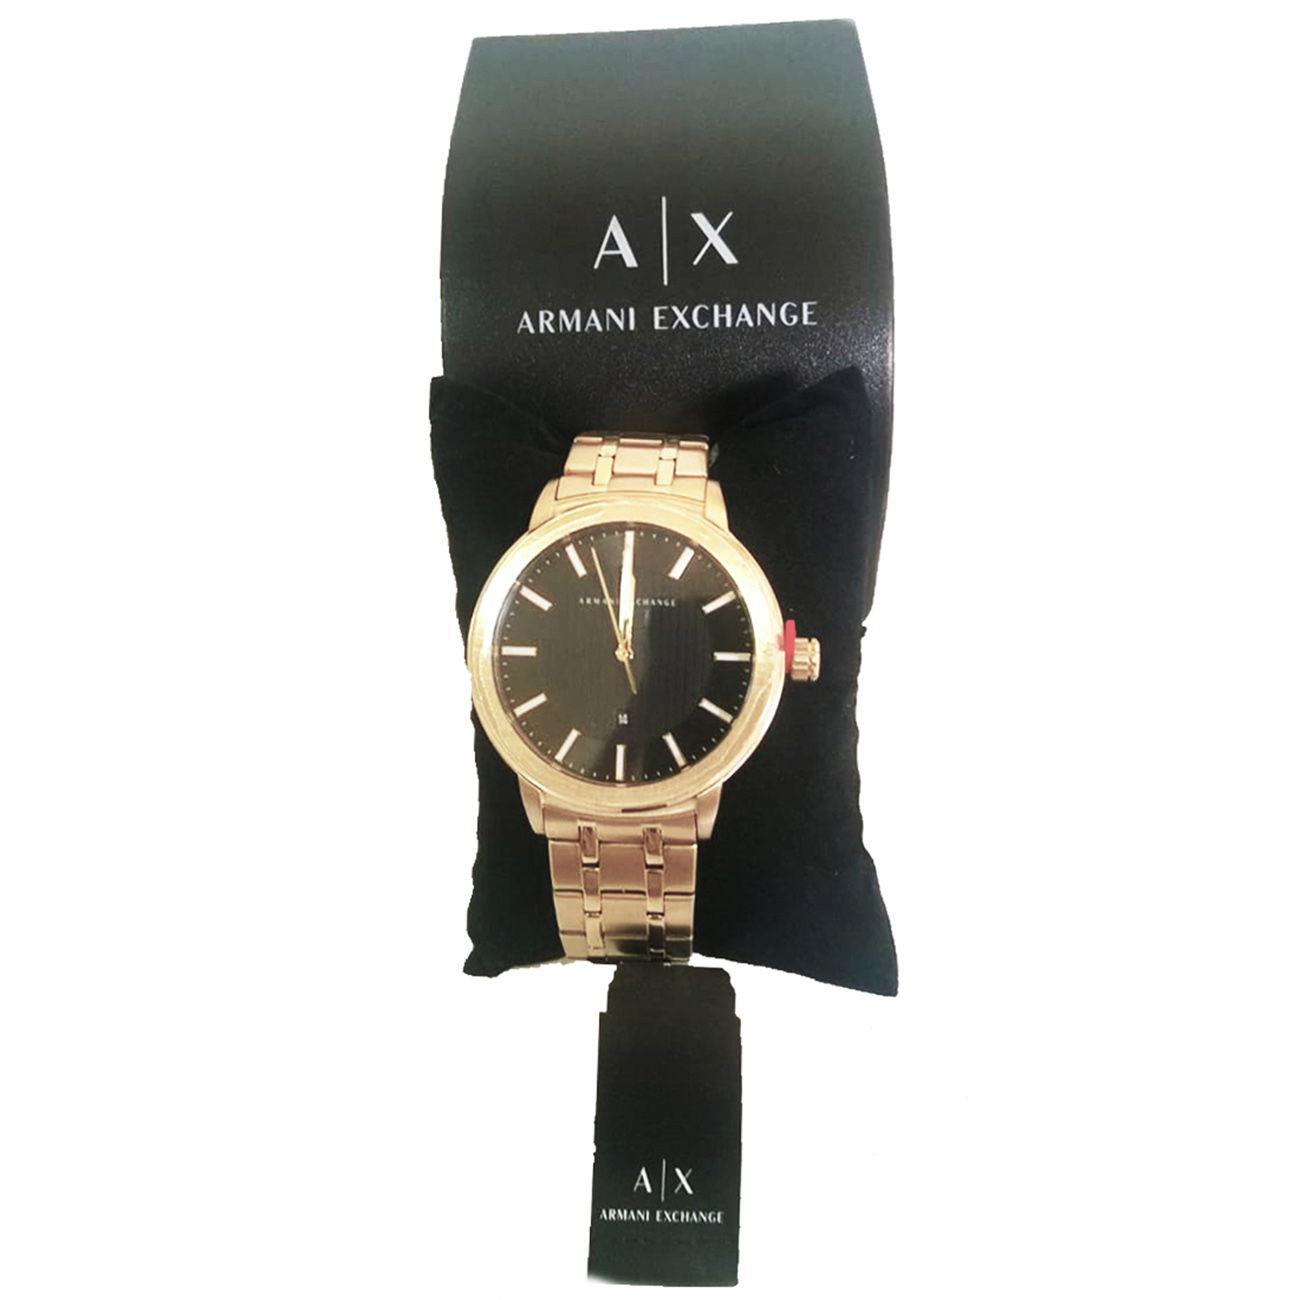 af16bbef5ea7f Relógio Armani Exchange AX14564PN Dourado R  699,90 à vista. Adicionar à  sacola